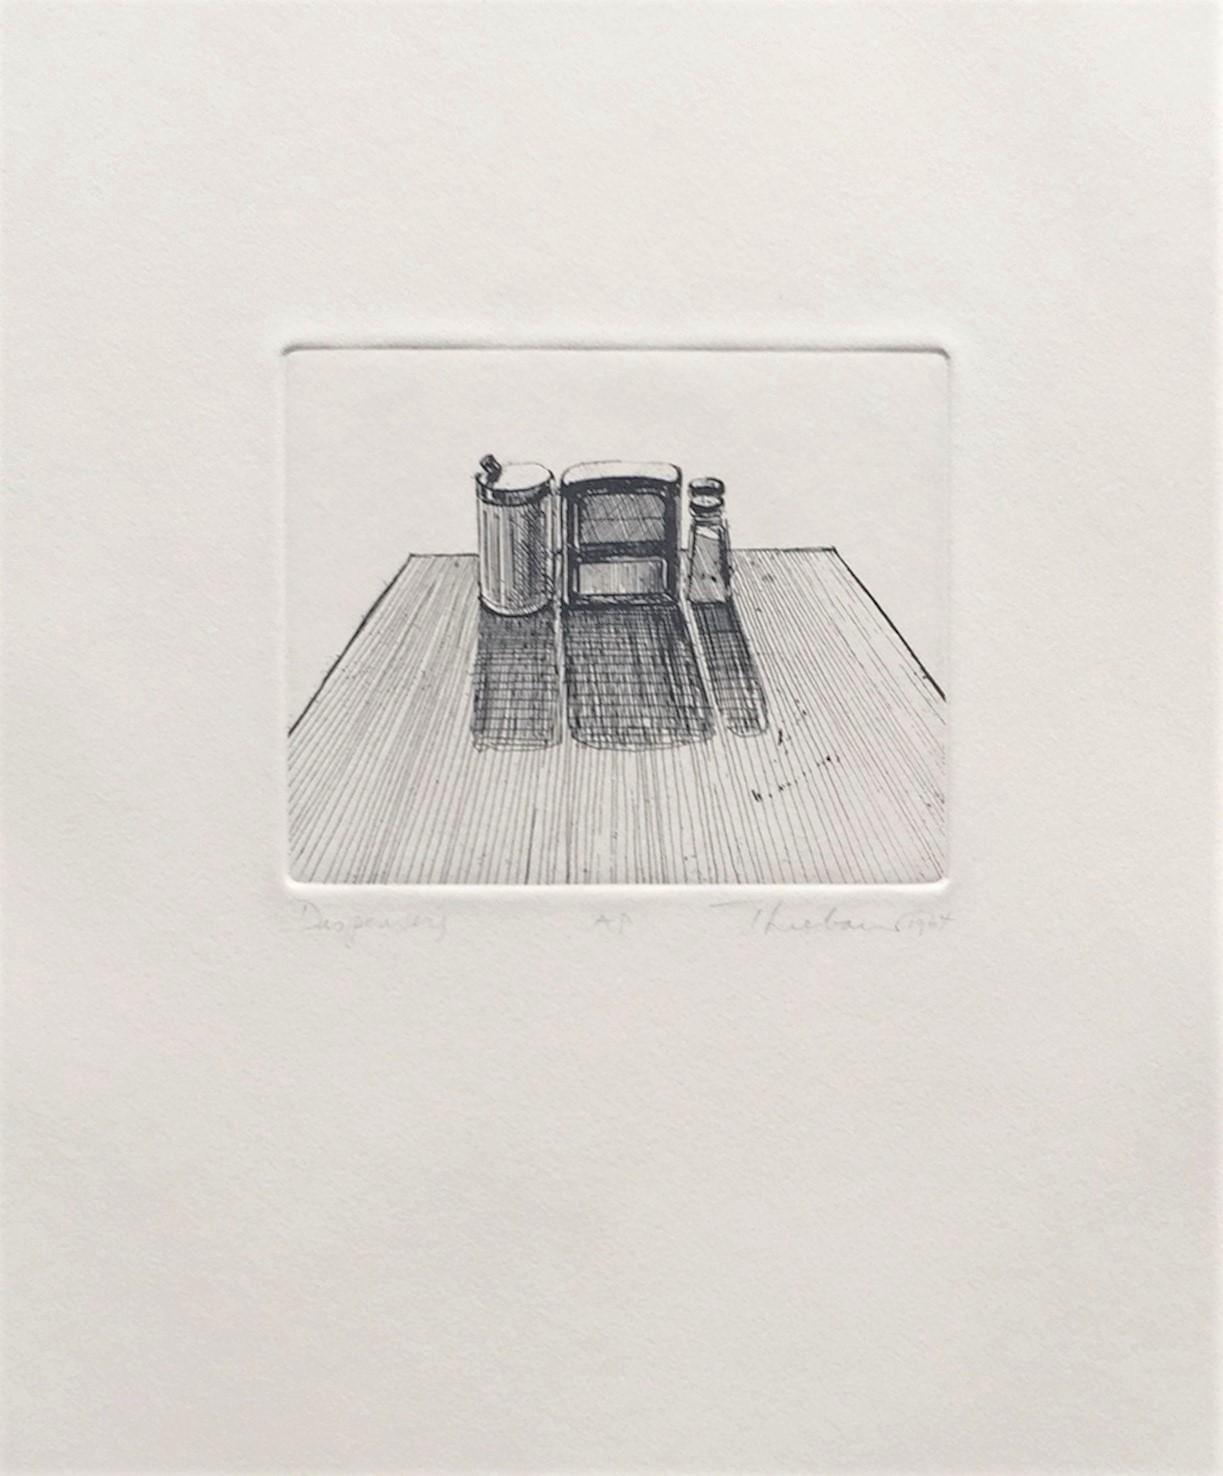 Café Table (Dispensers) by Wayne Thiebaud